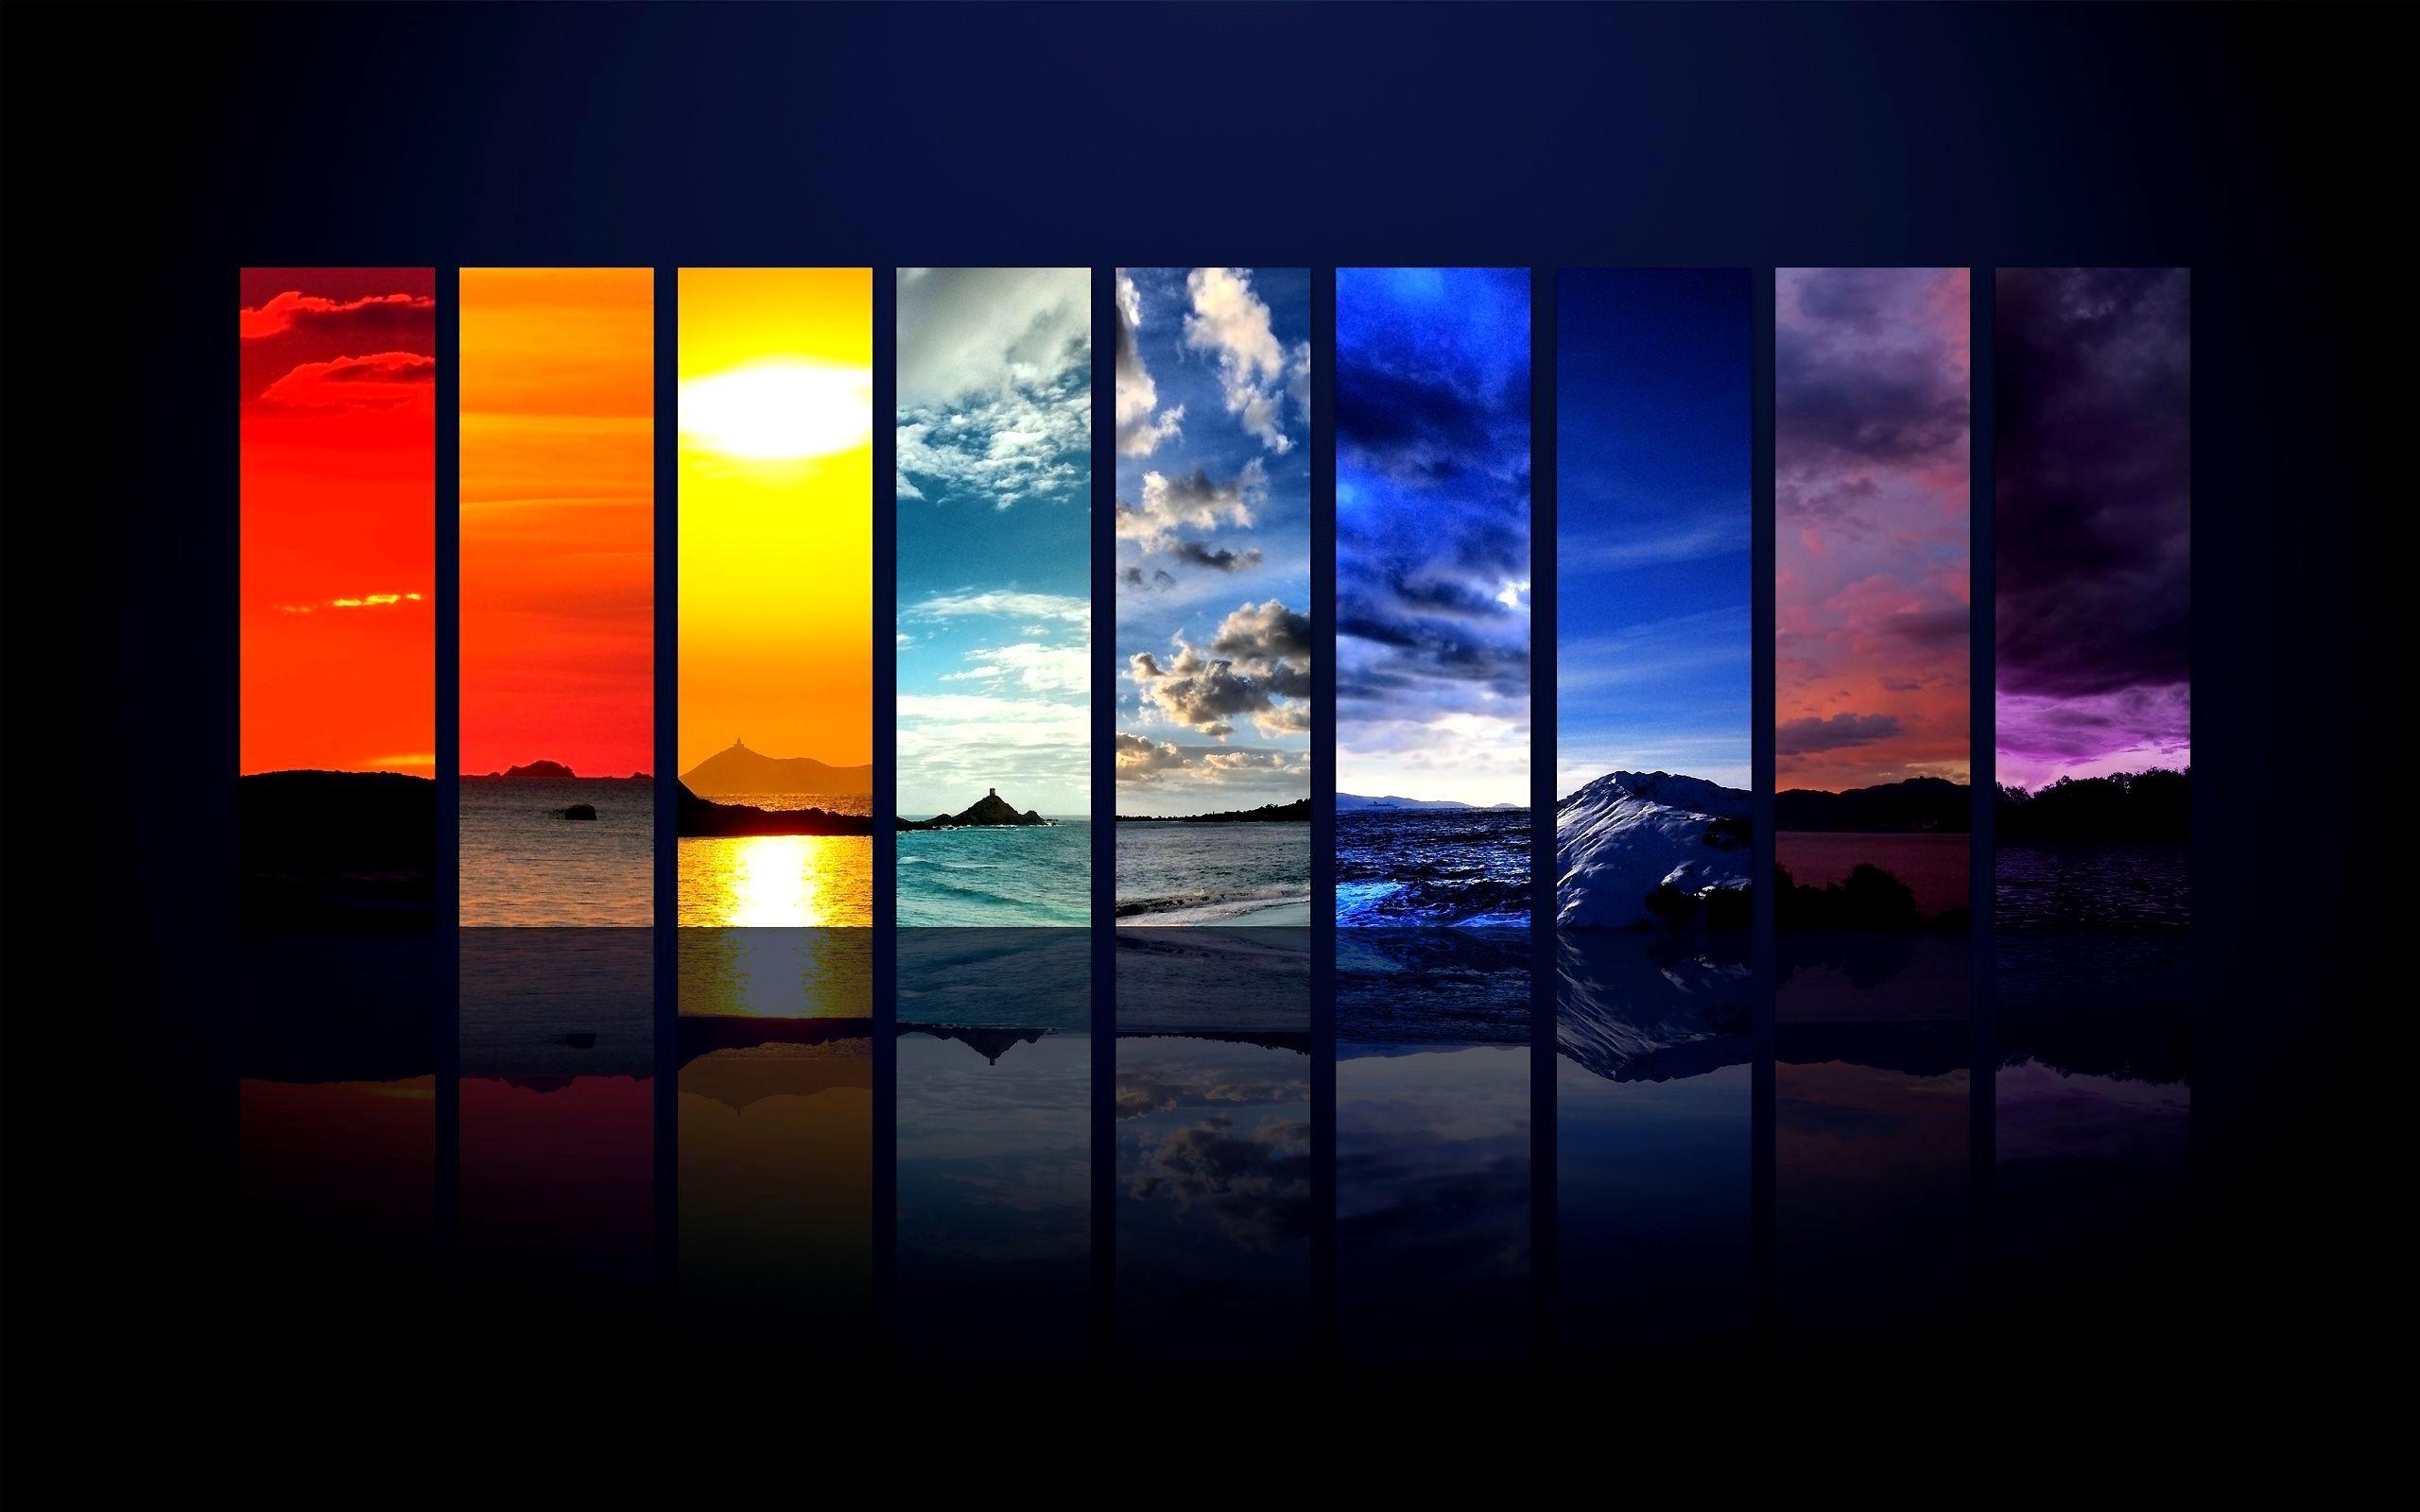 Seasons Wallpapers Gallery Background Hd Wallpaper Cool Desktop Backgrounds Desktop Background Pictures